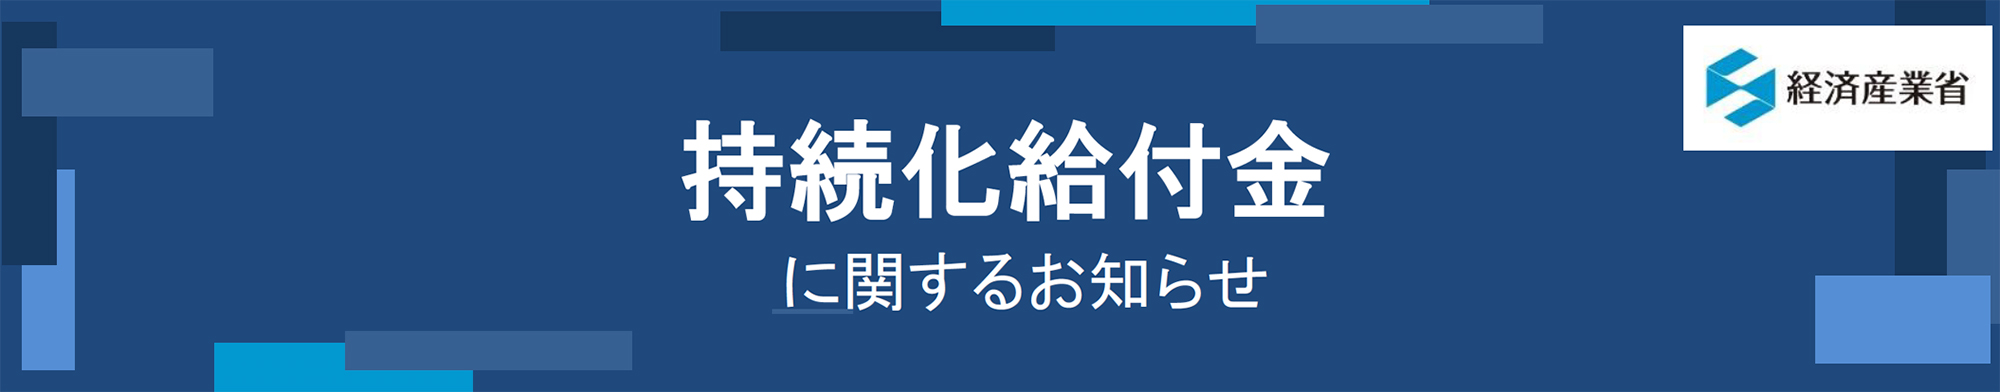 kyufukin20200427_banner